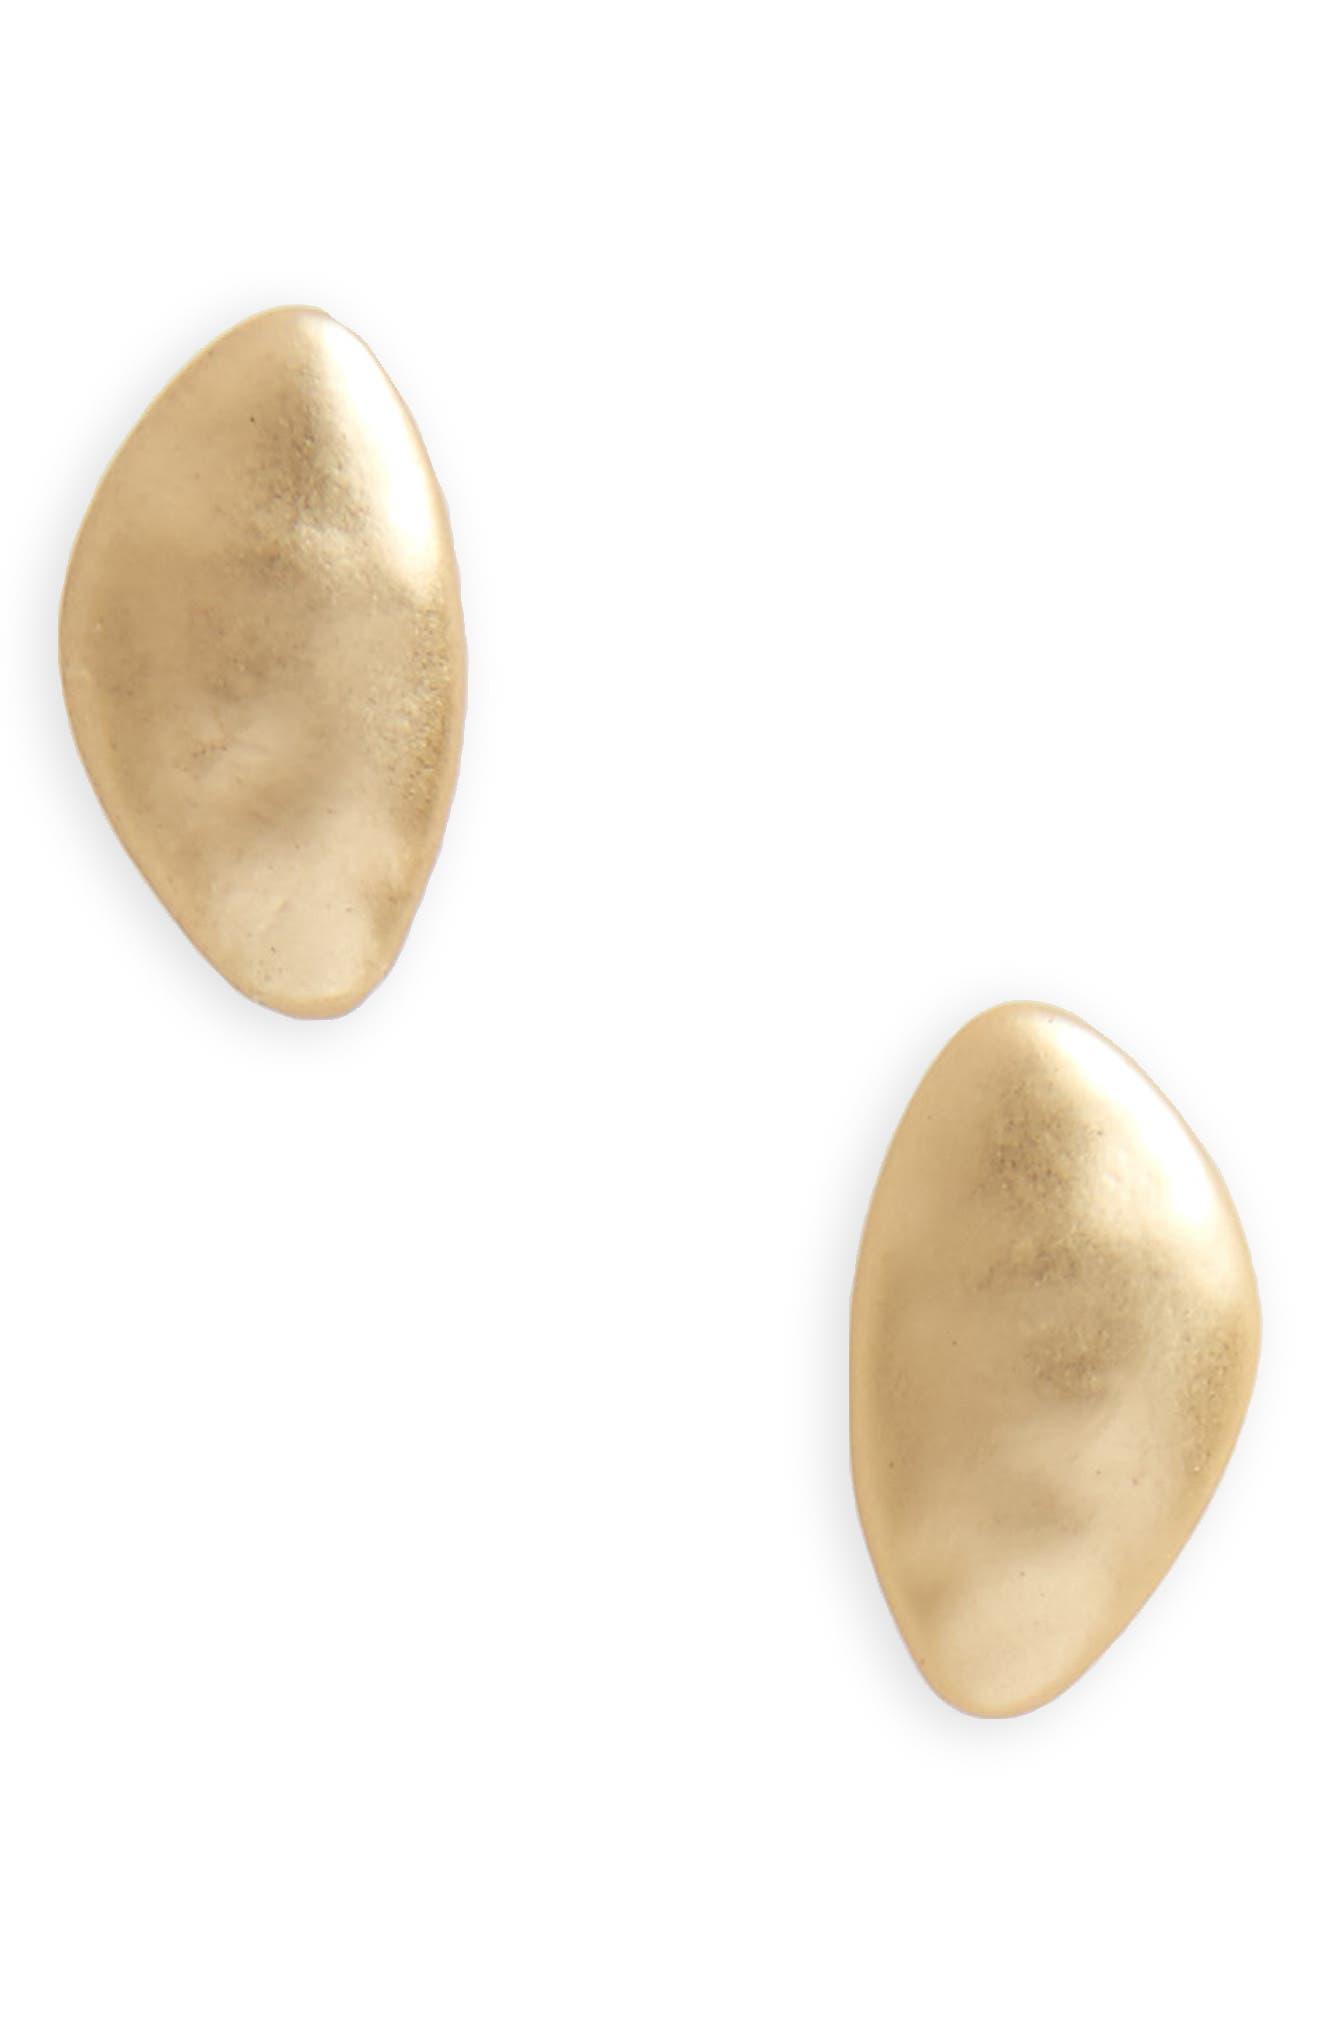 Brushed Metal Stud Earrings,                         Main,                         color, Worn Gold